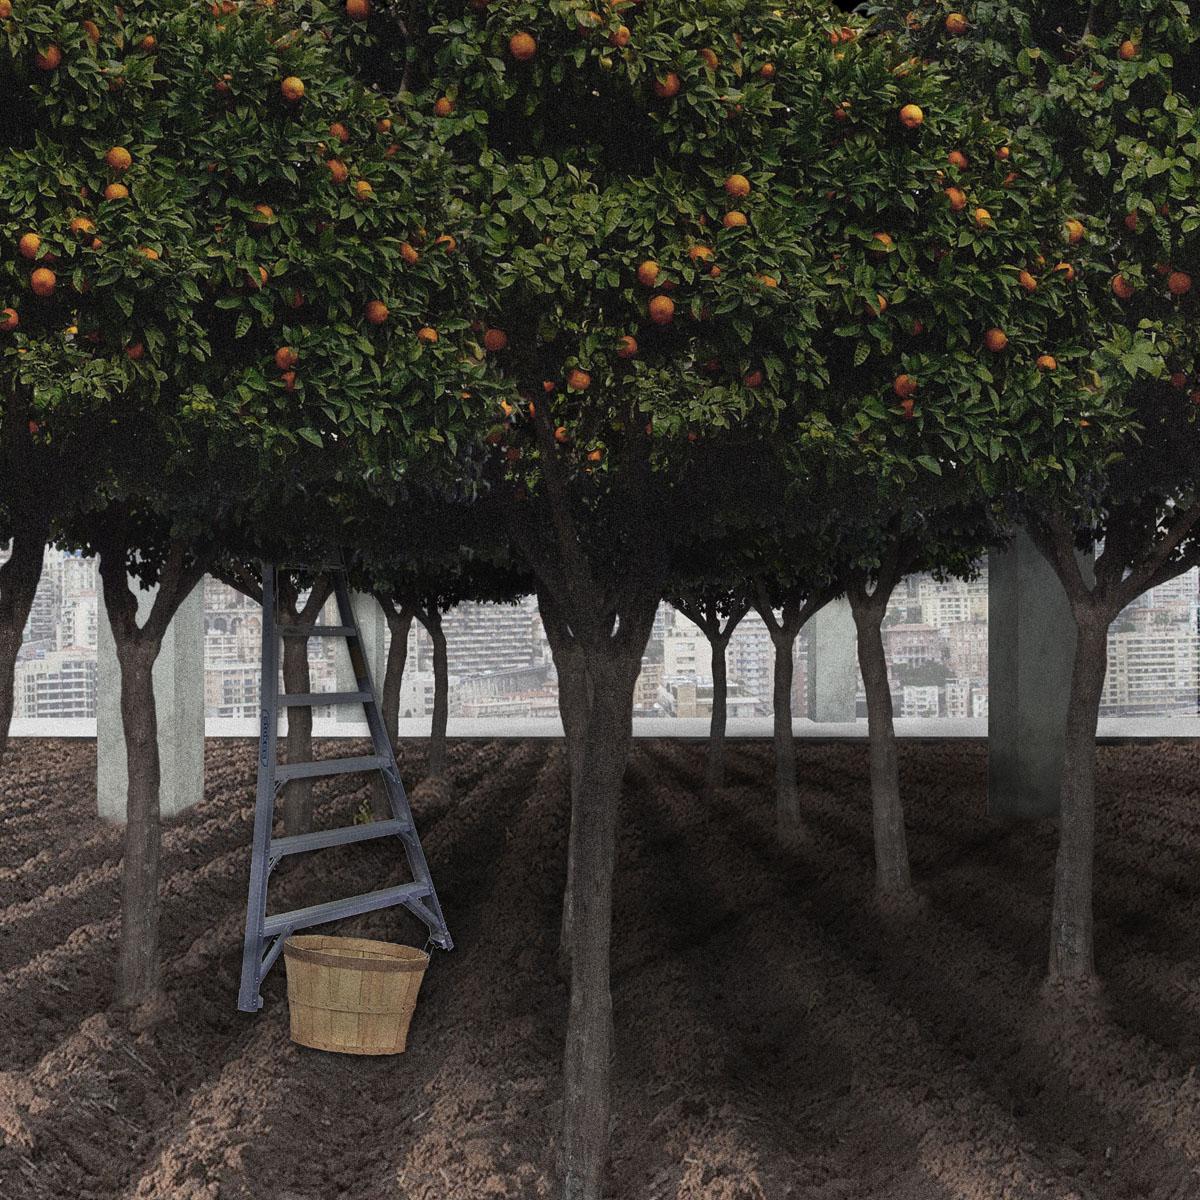 02_Orchard_F01.jpg